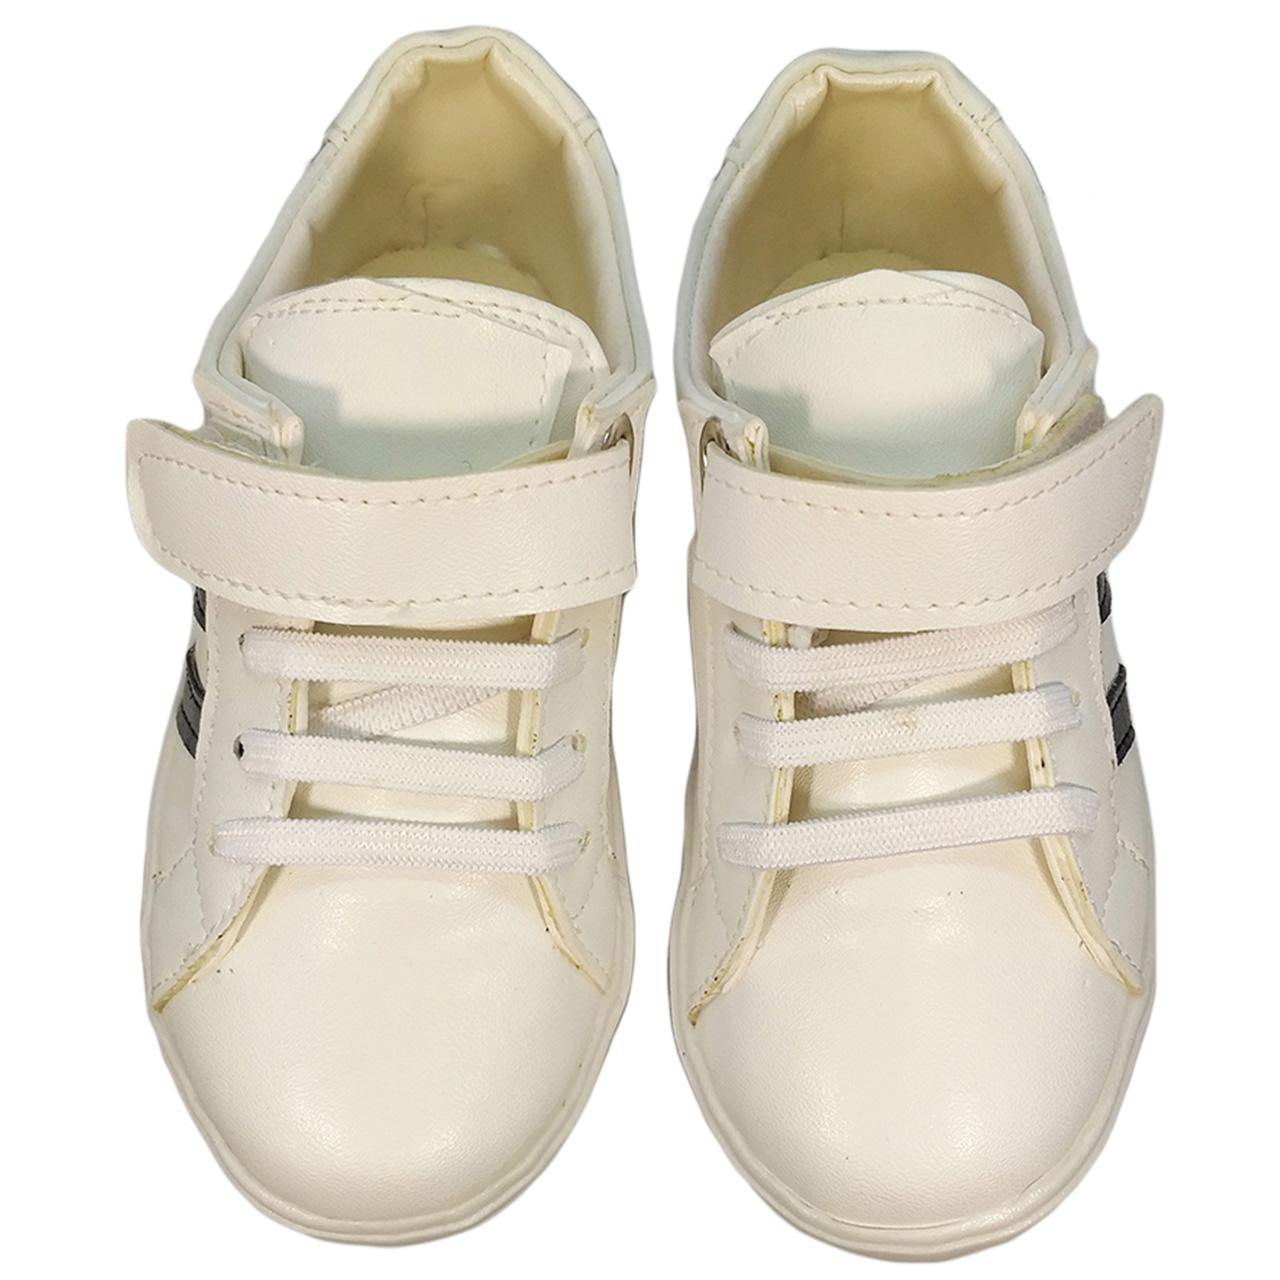 کفش مخصوص پیاده روی پسرانه کد 2L_WPS95